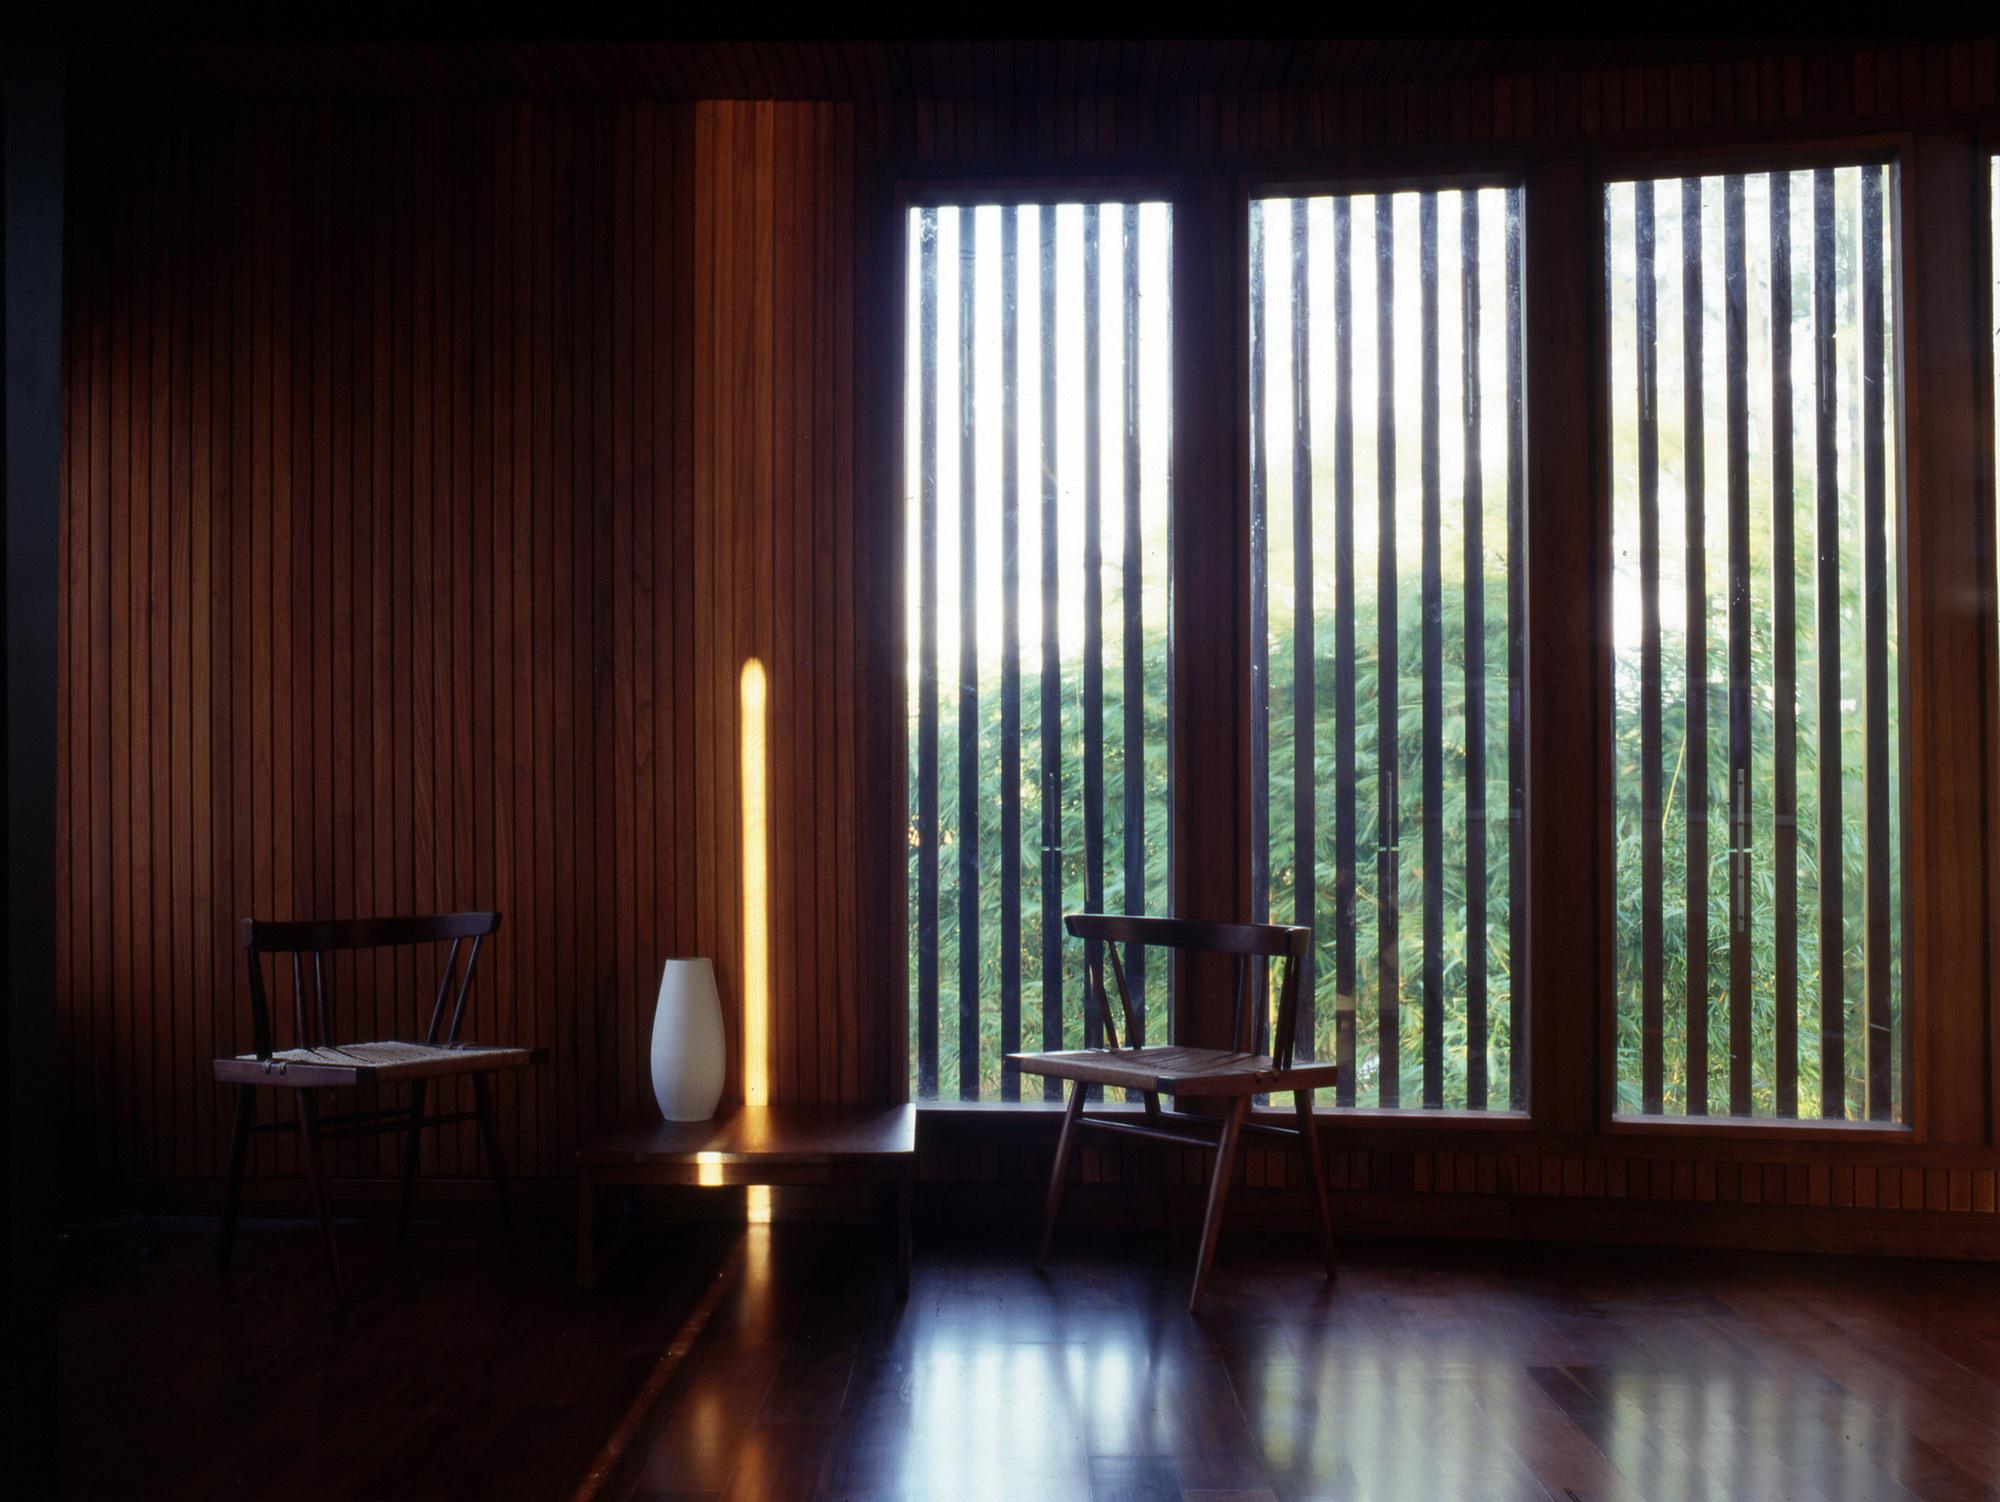 residencia-tavernier-drive-luis-pons-design-lab_apollo_design045